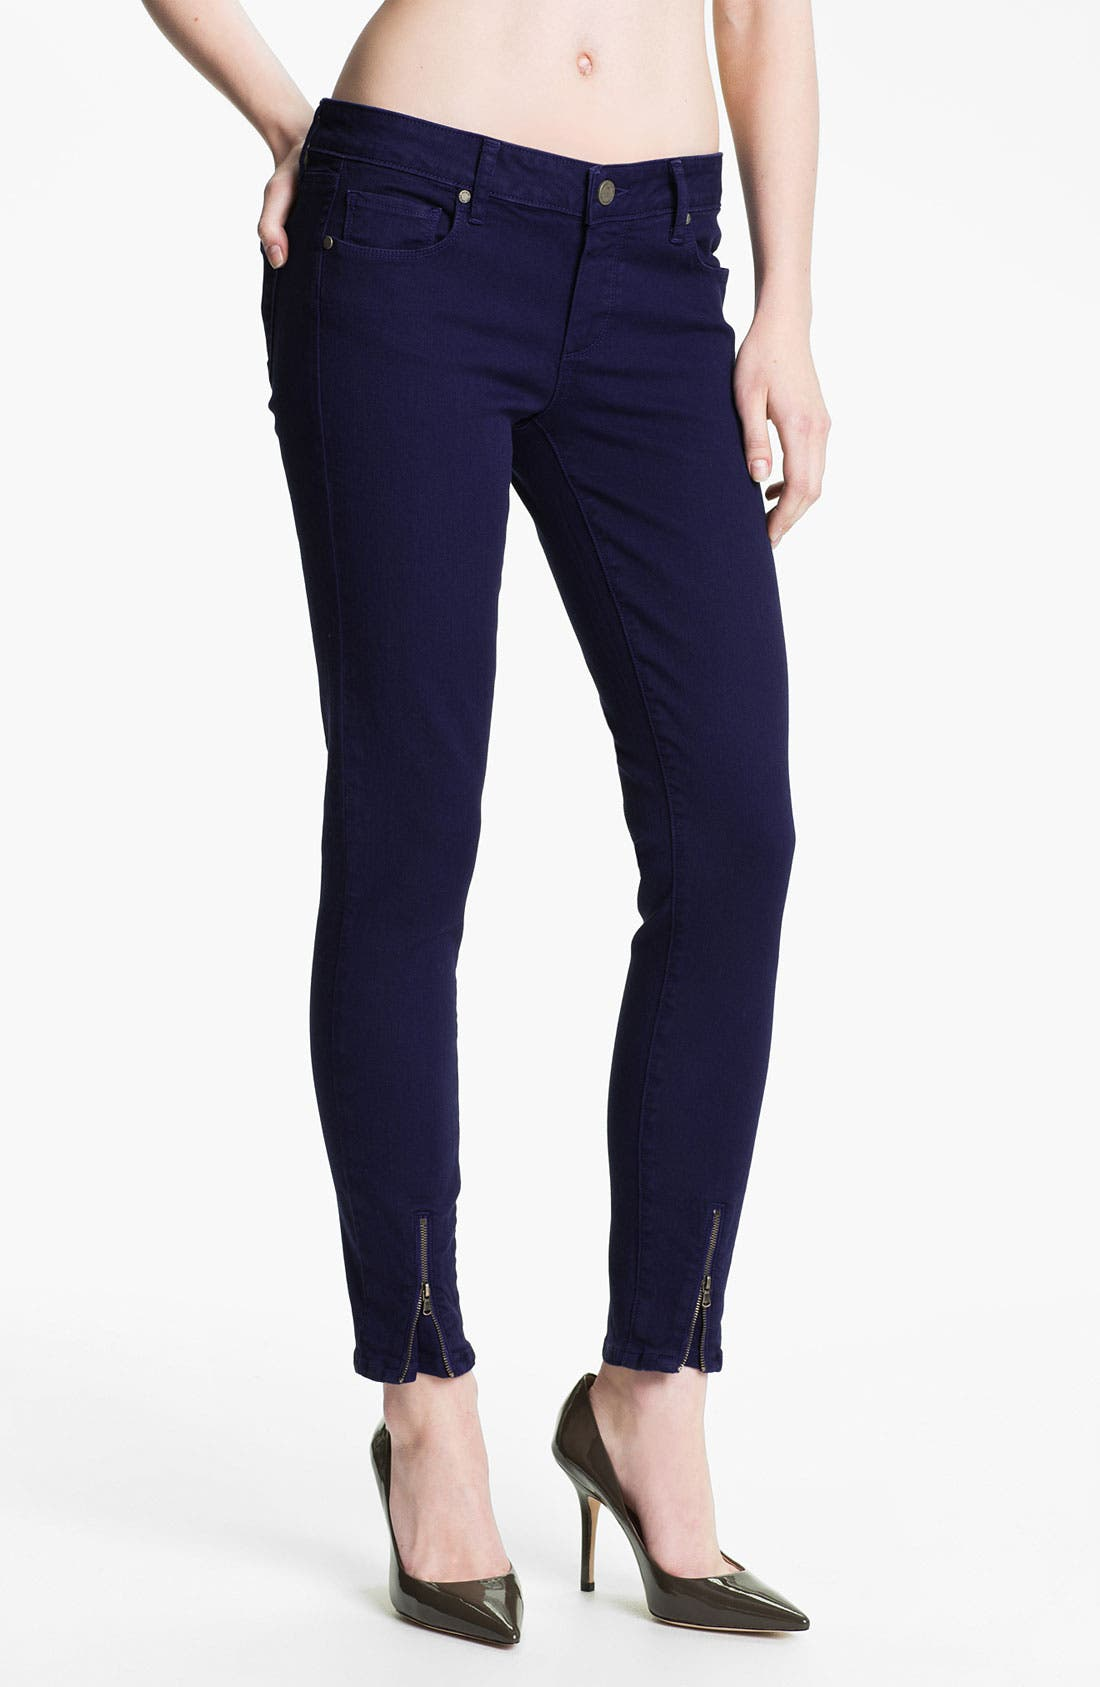 Alternate Image 1 Selected - Paige Denim Ankle Zip Skinny Jeans (Pacific Dusk)